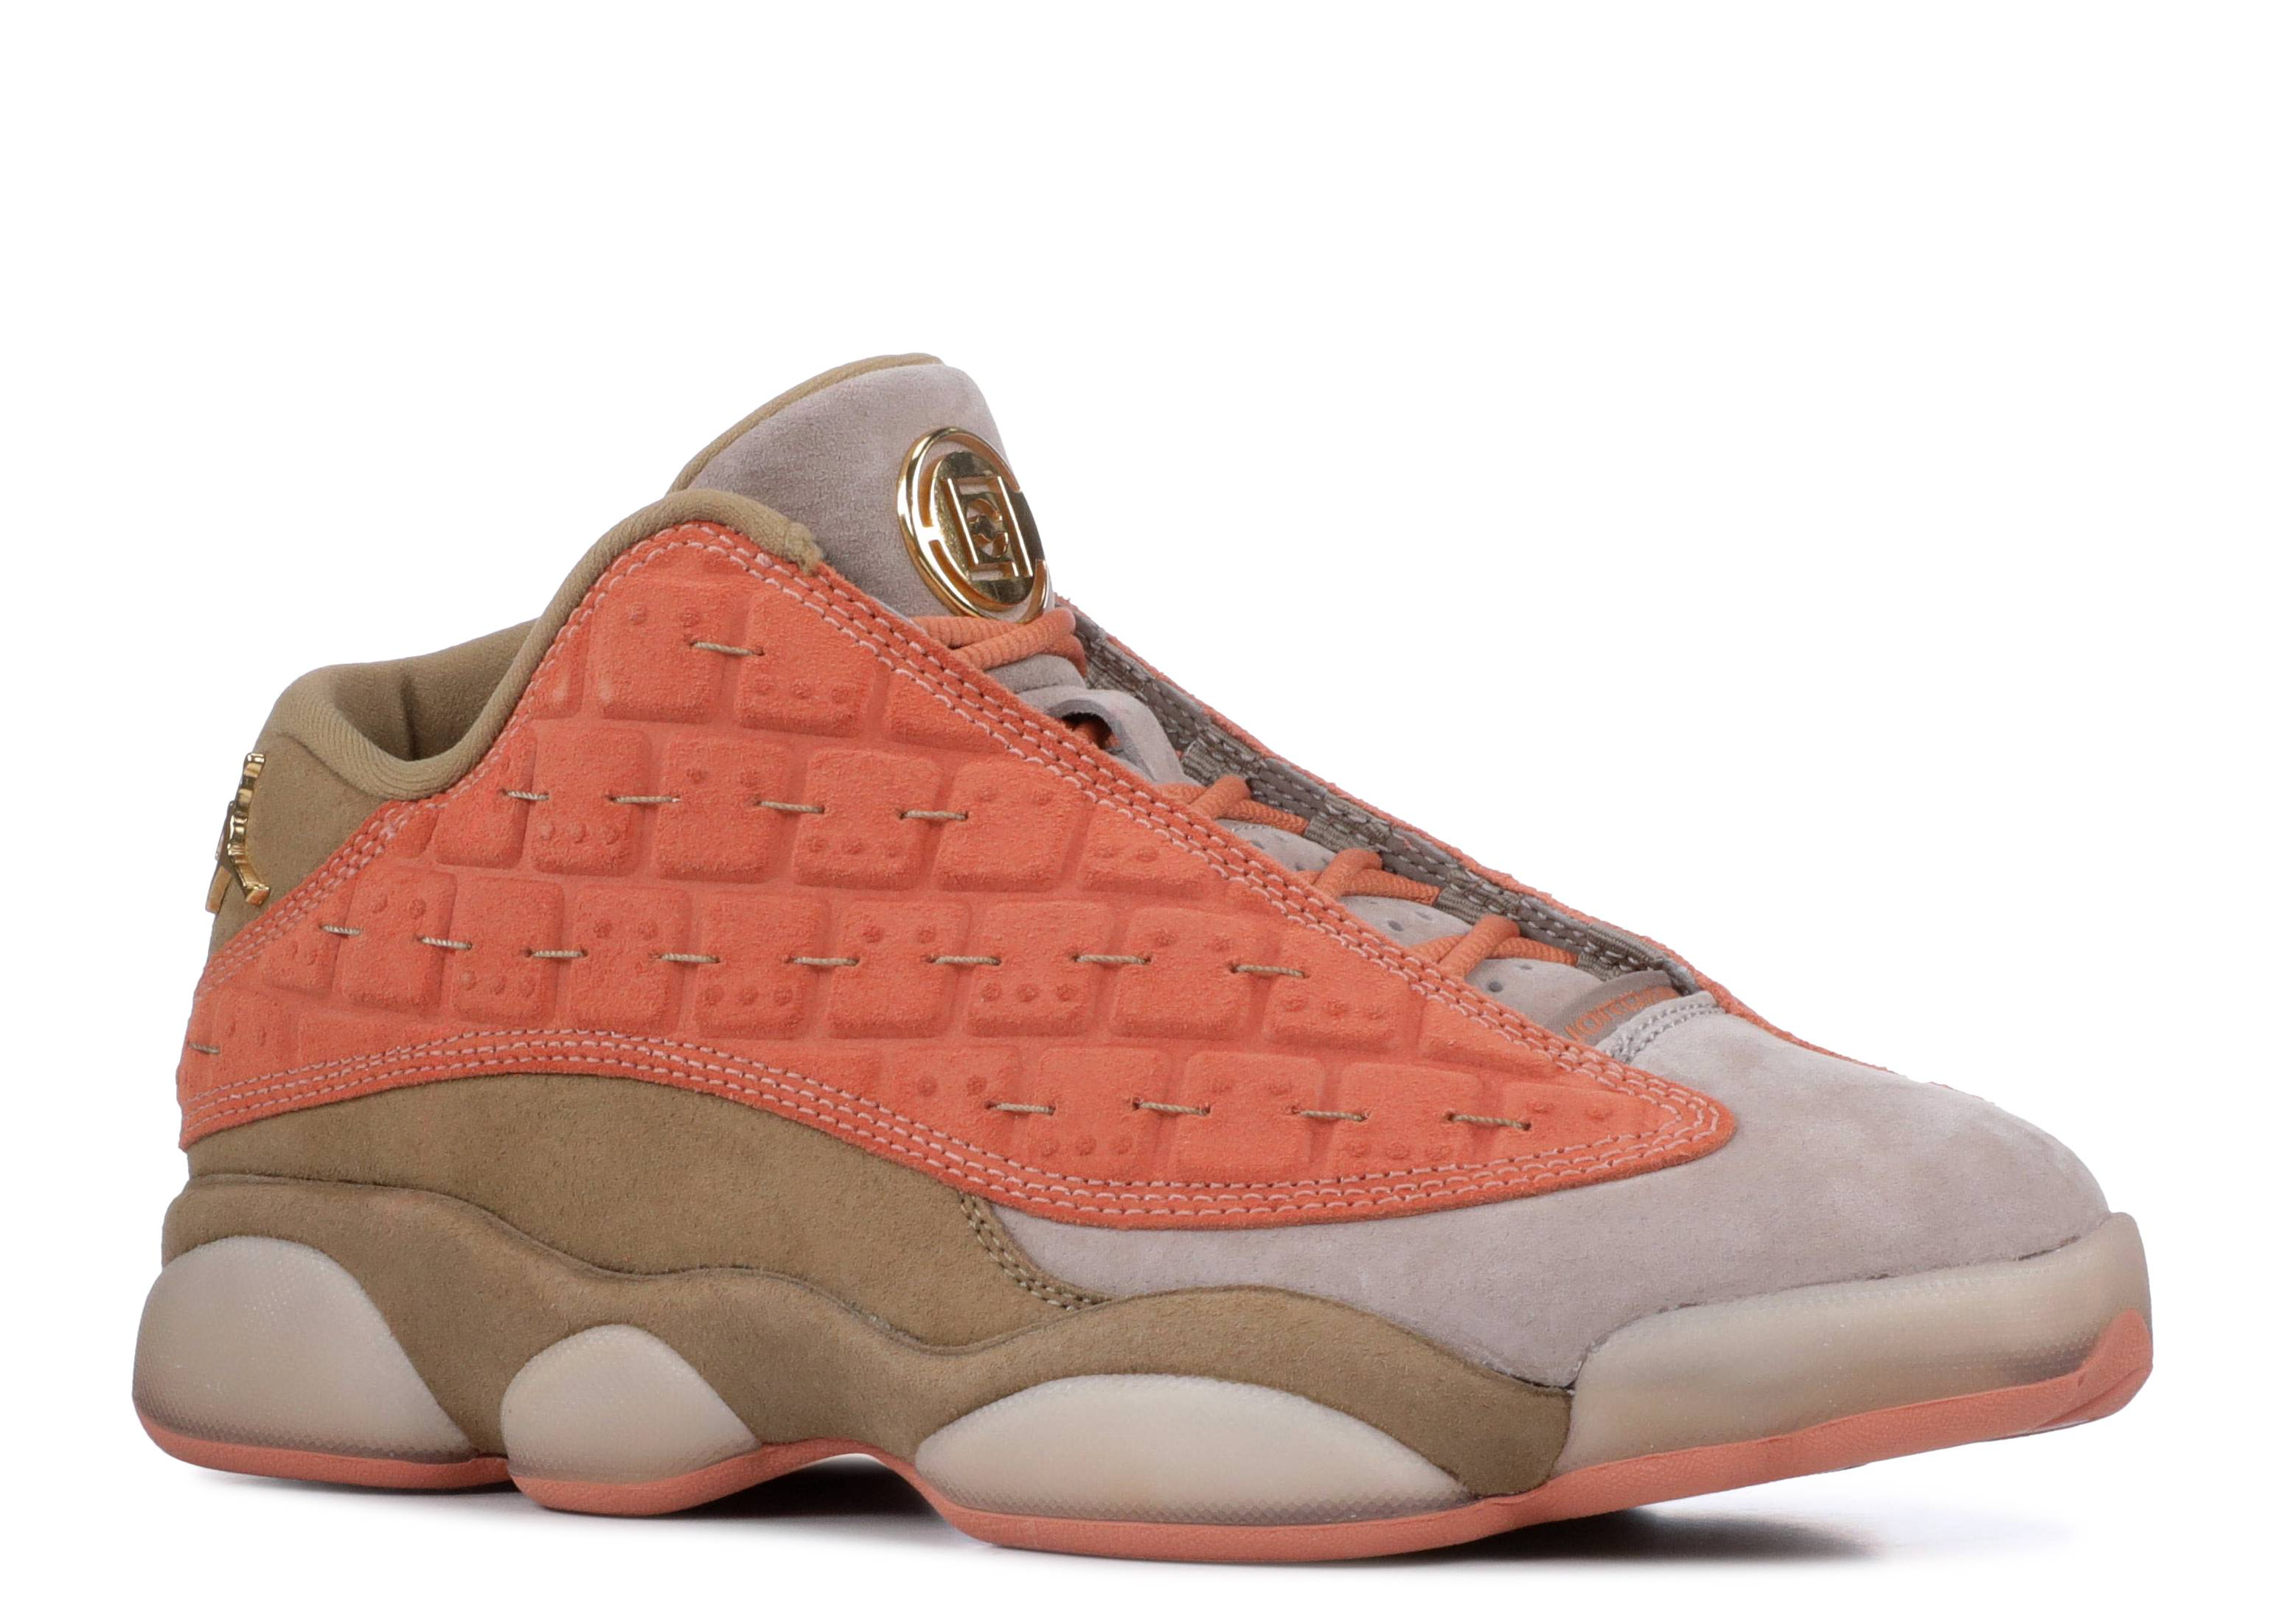 0c2fc4d2fa4f15 Air Jordan 13 Retro Low Nrg ct